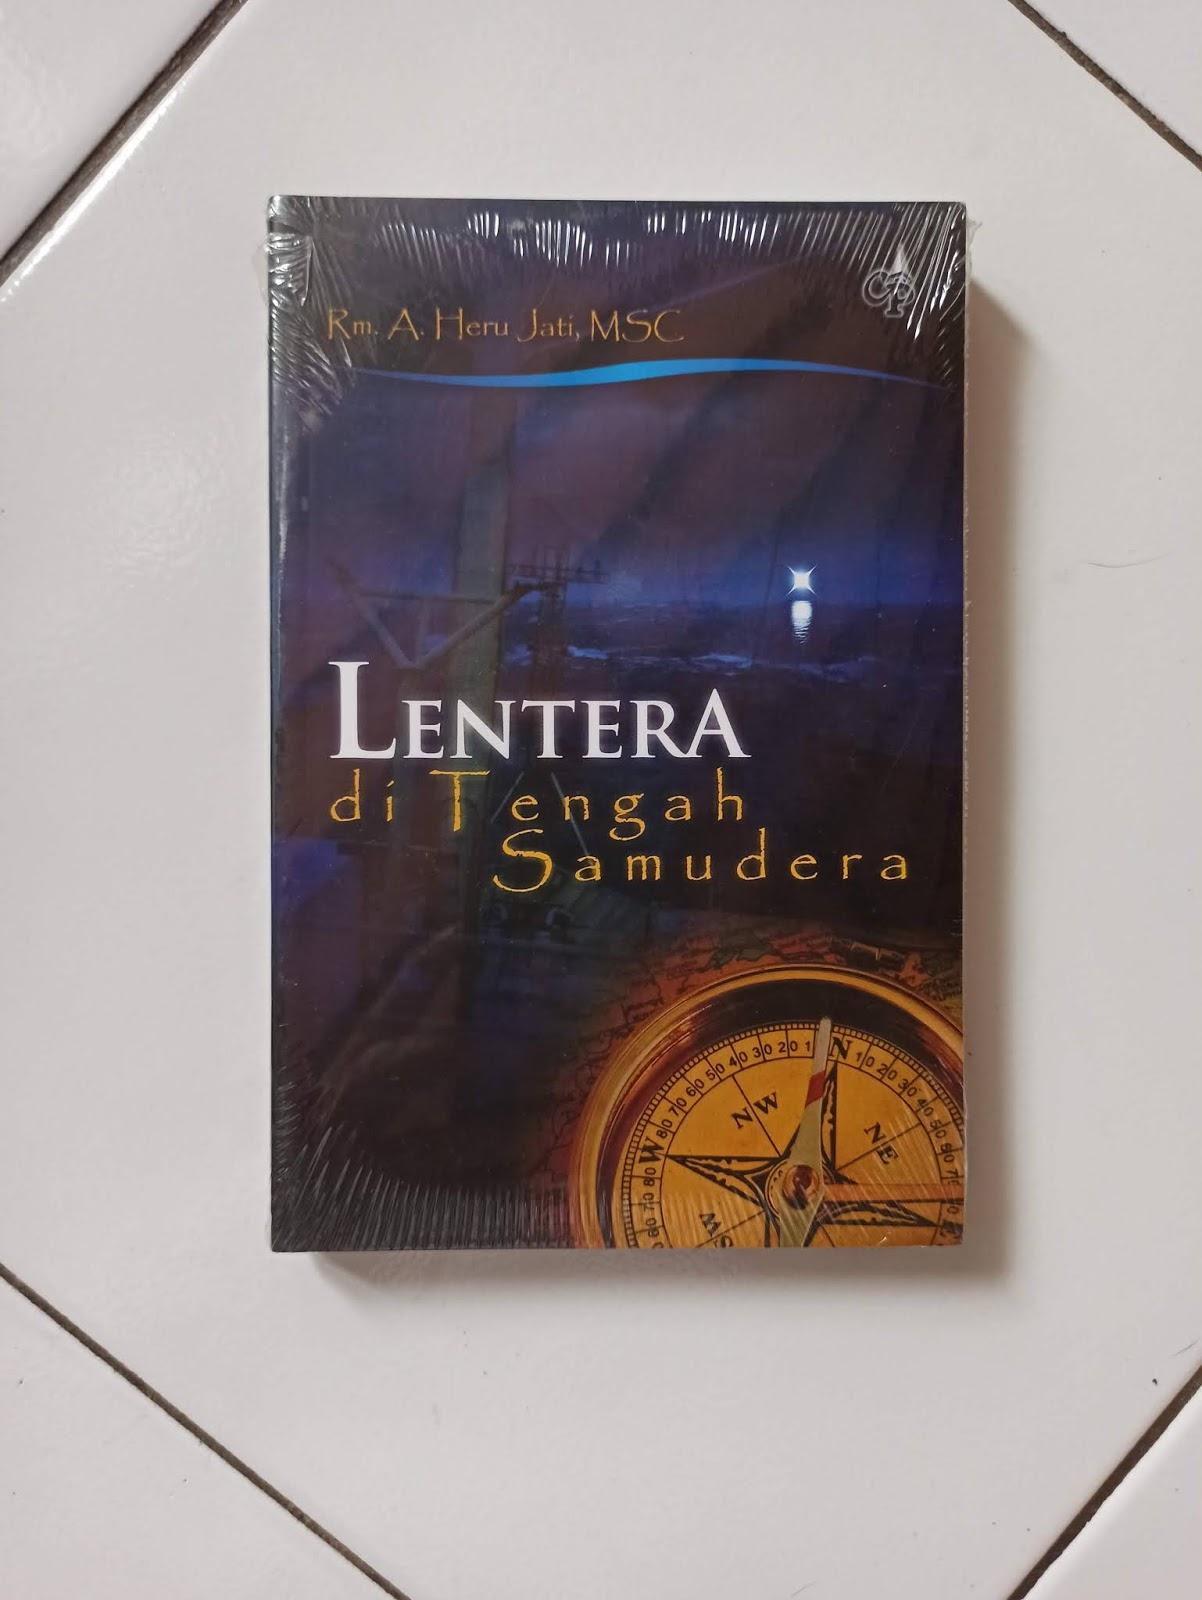 Buku Lentera di Tengah Samudera Penulis A. Heru Jati